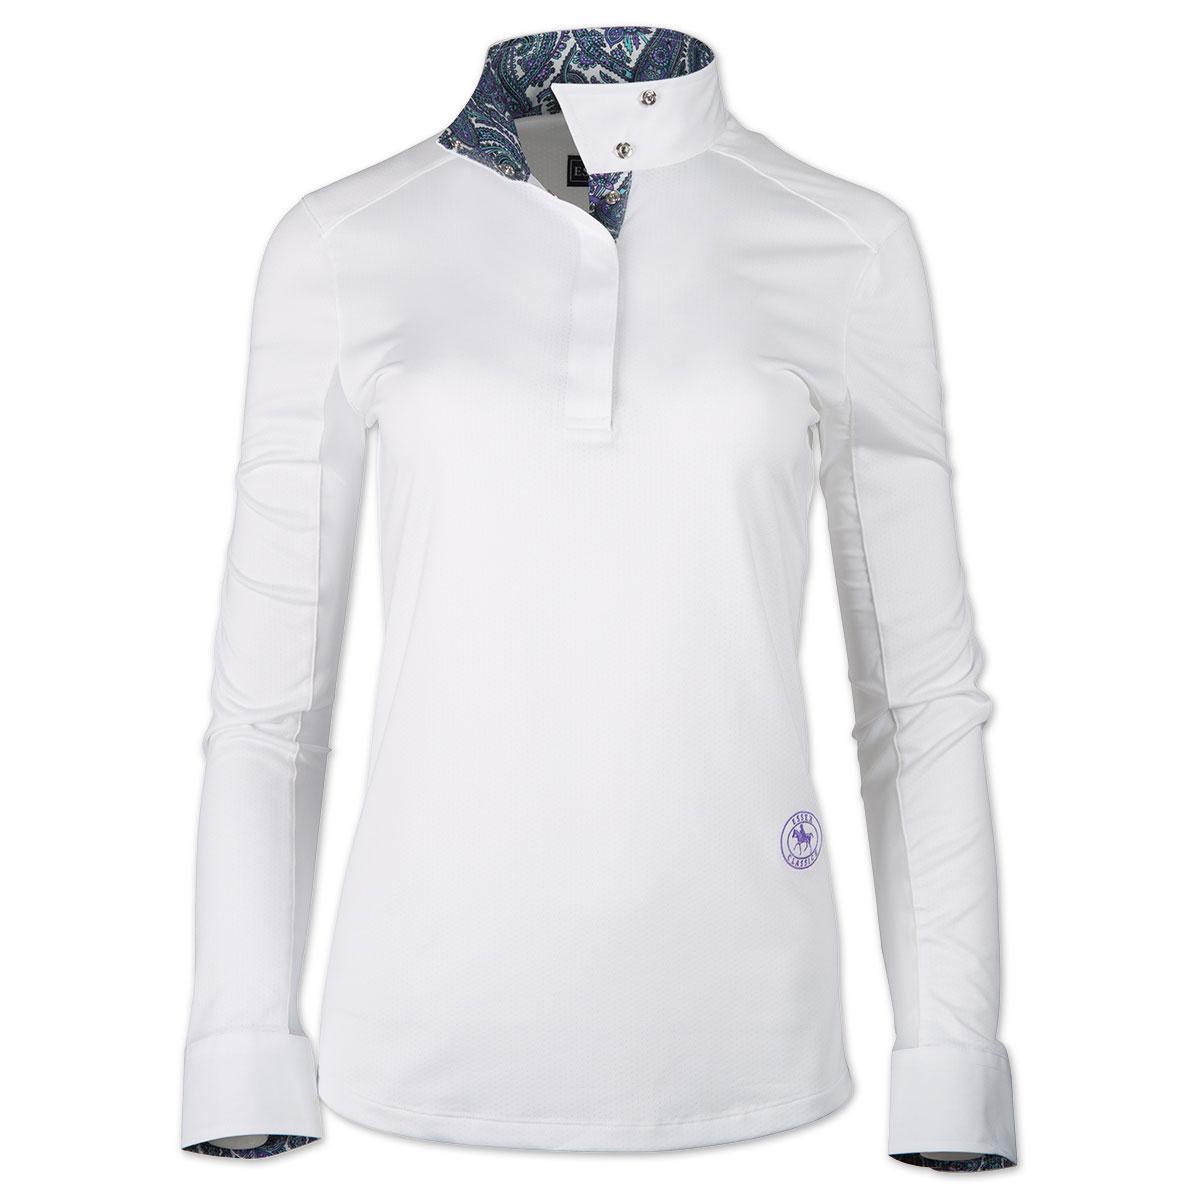 Essex Classics Talent Yarn Shirt - Longsleeve - Clearance!